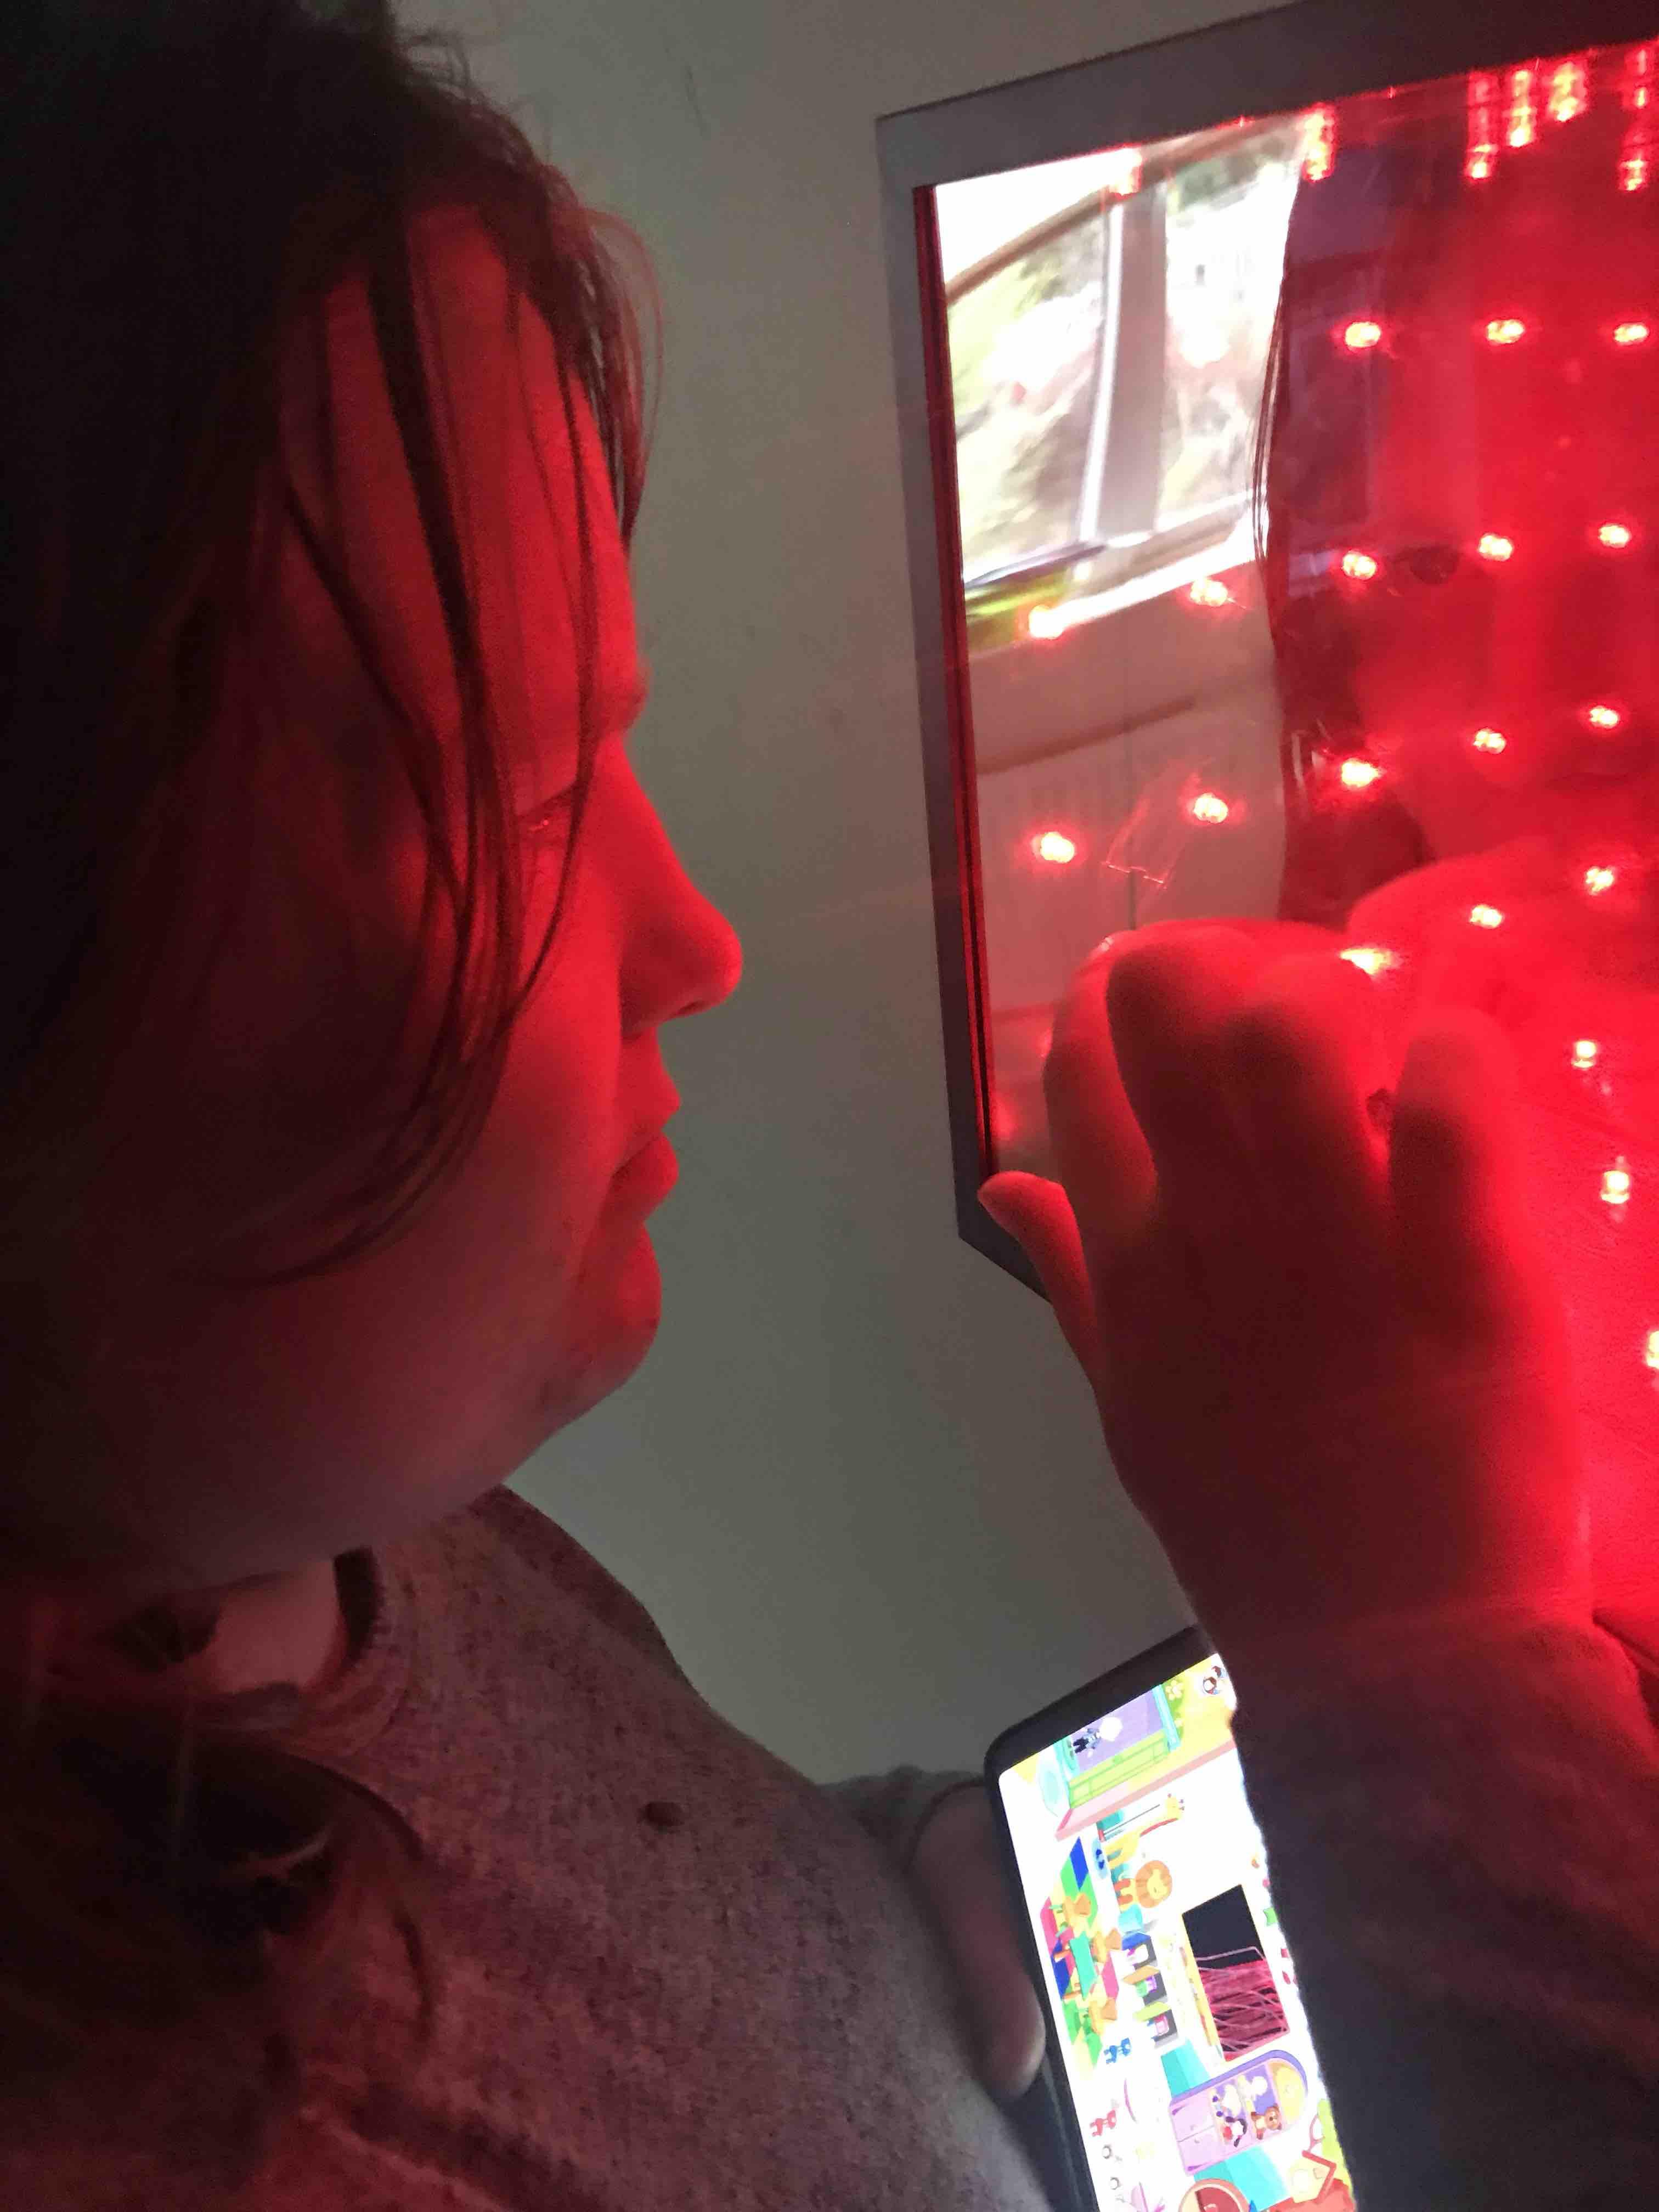 Red Infinity Light sensory Autism Adhd Spd